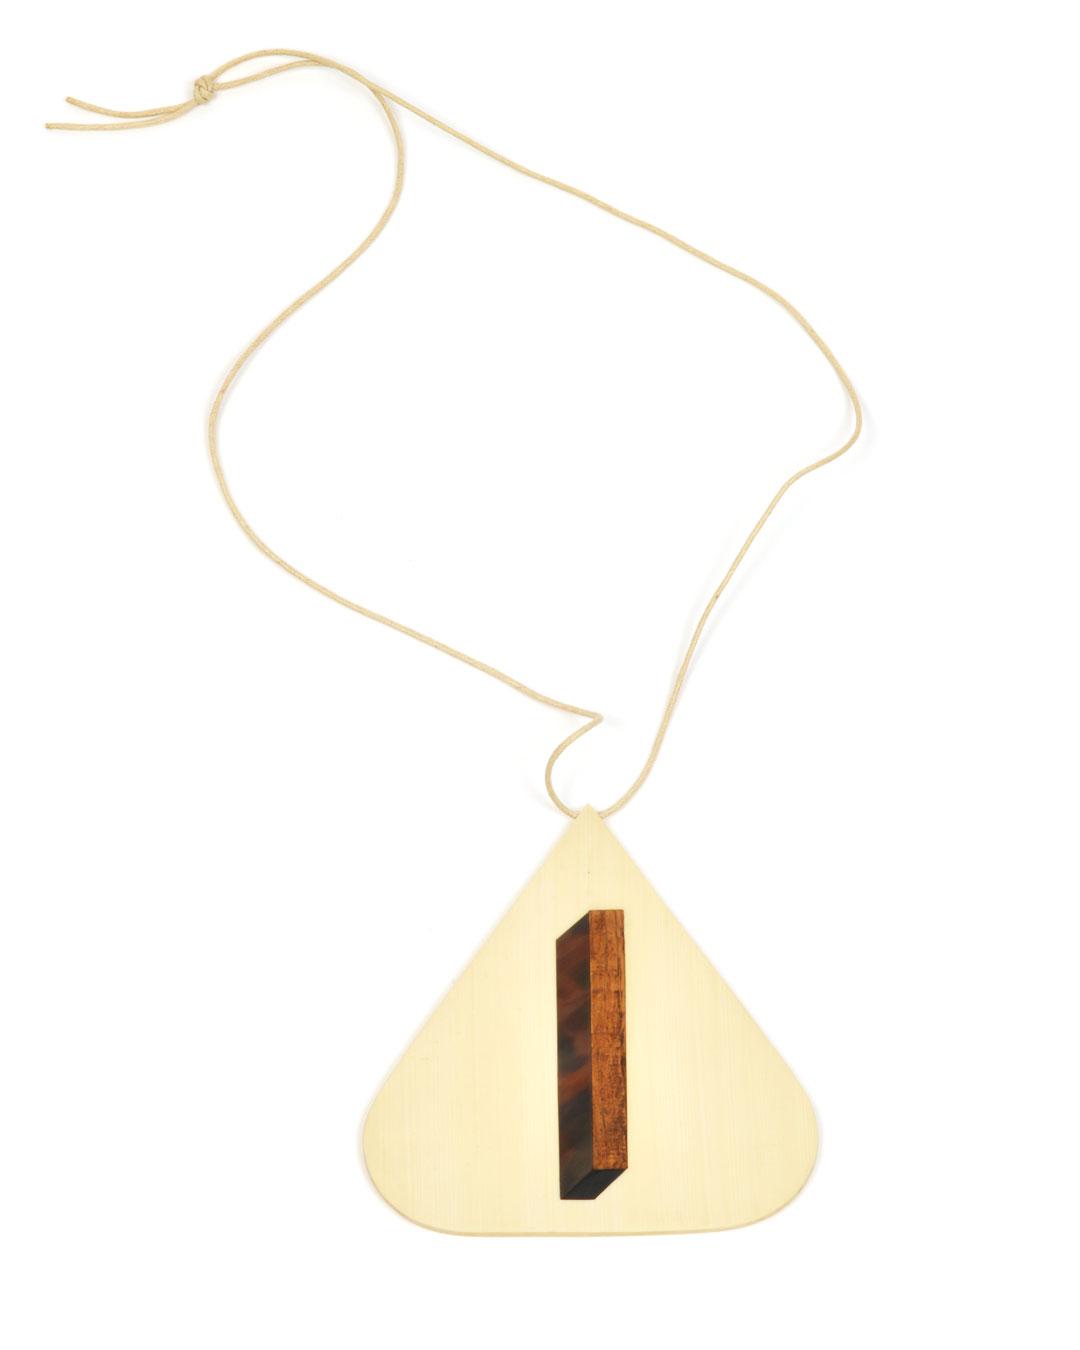 Julia Walter, Box 2, 2014, pendant; Galalith, oak wood, cotton string, 130 x 130 x 5 mm, €1980